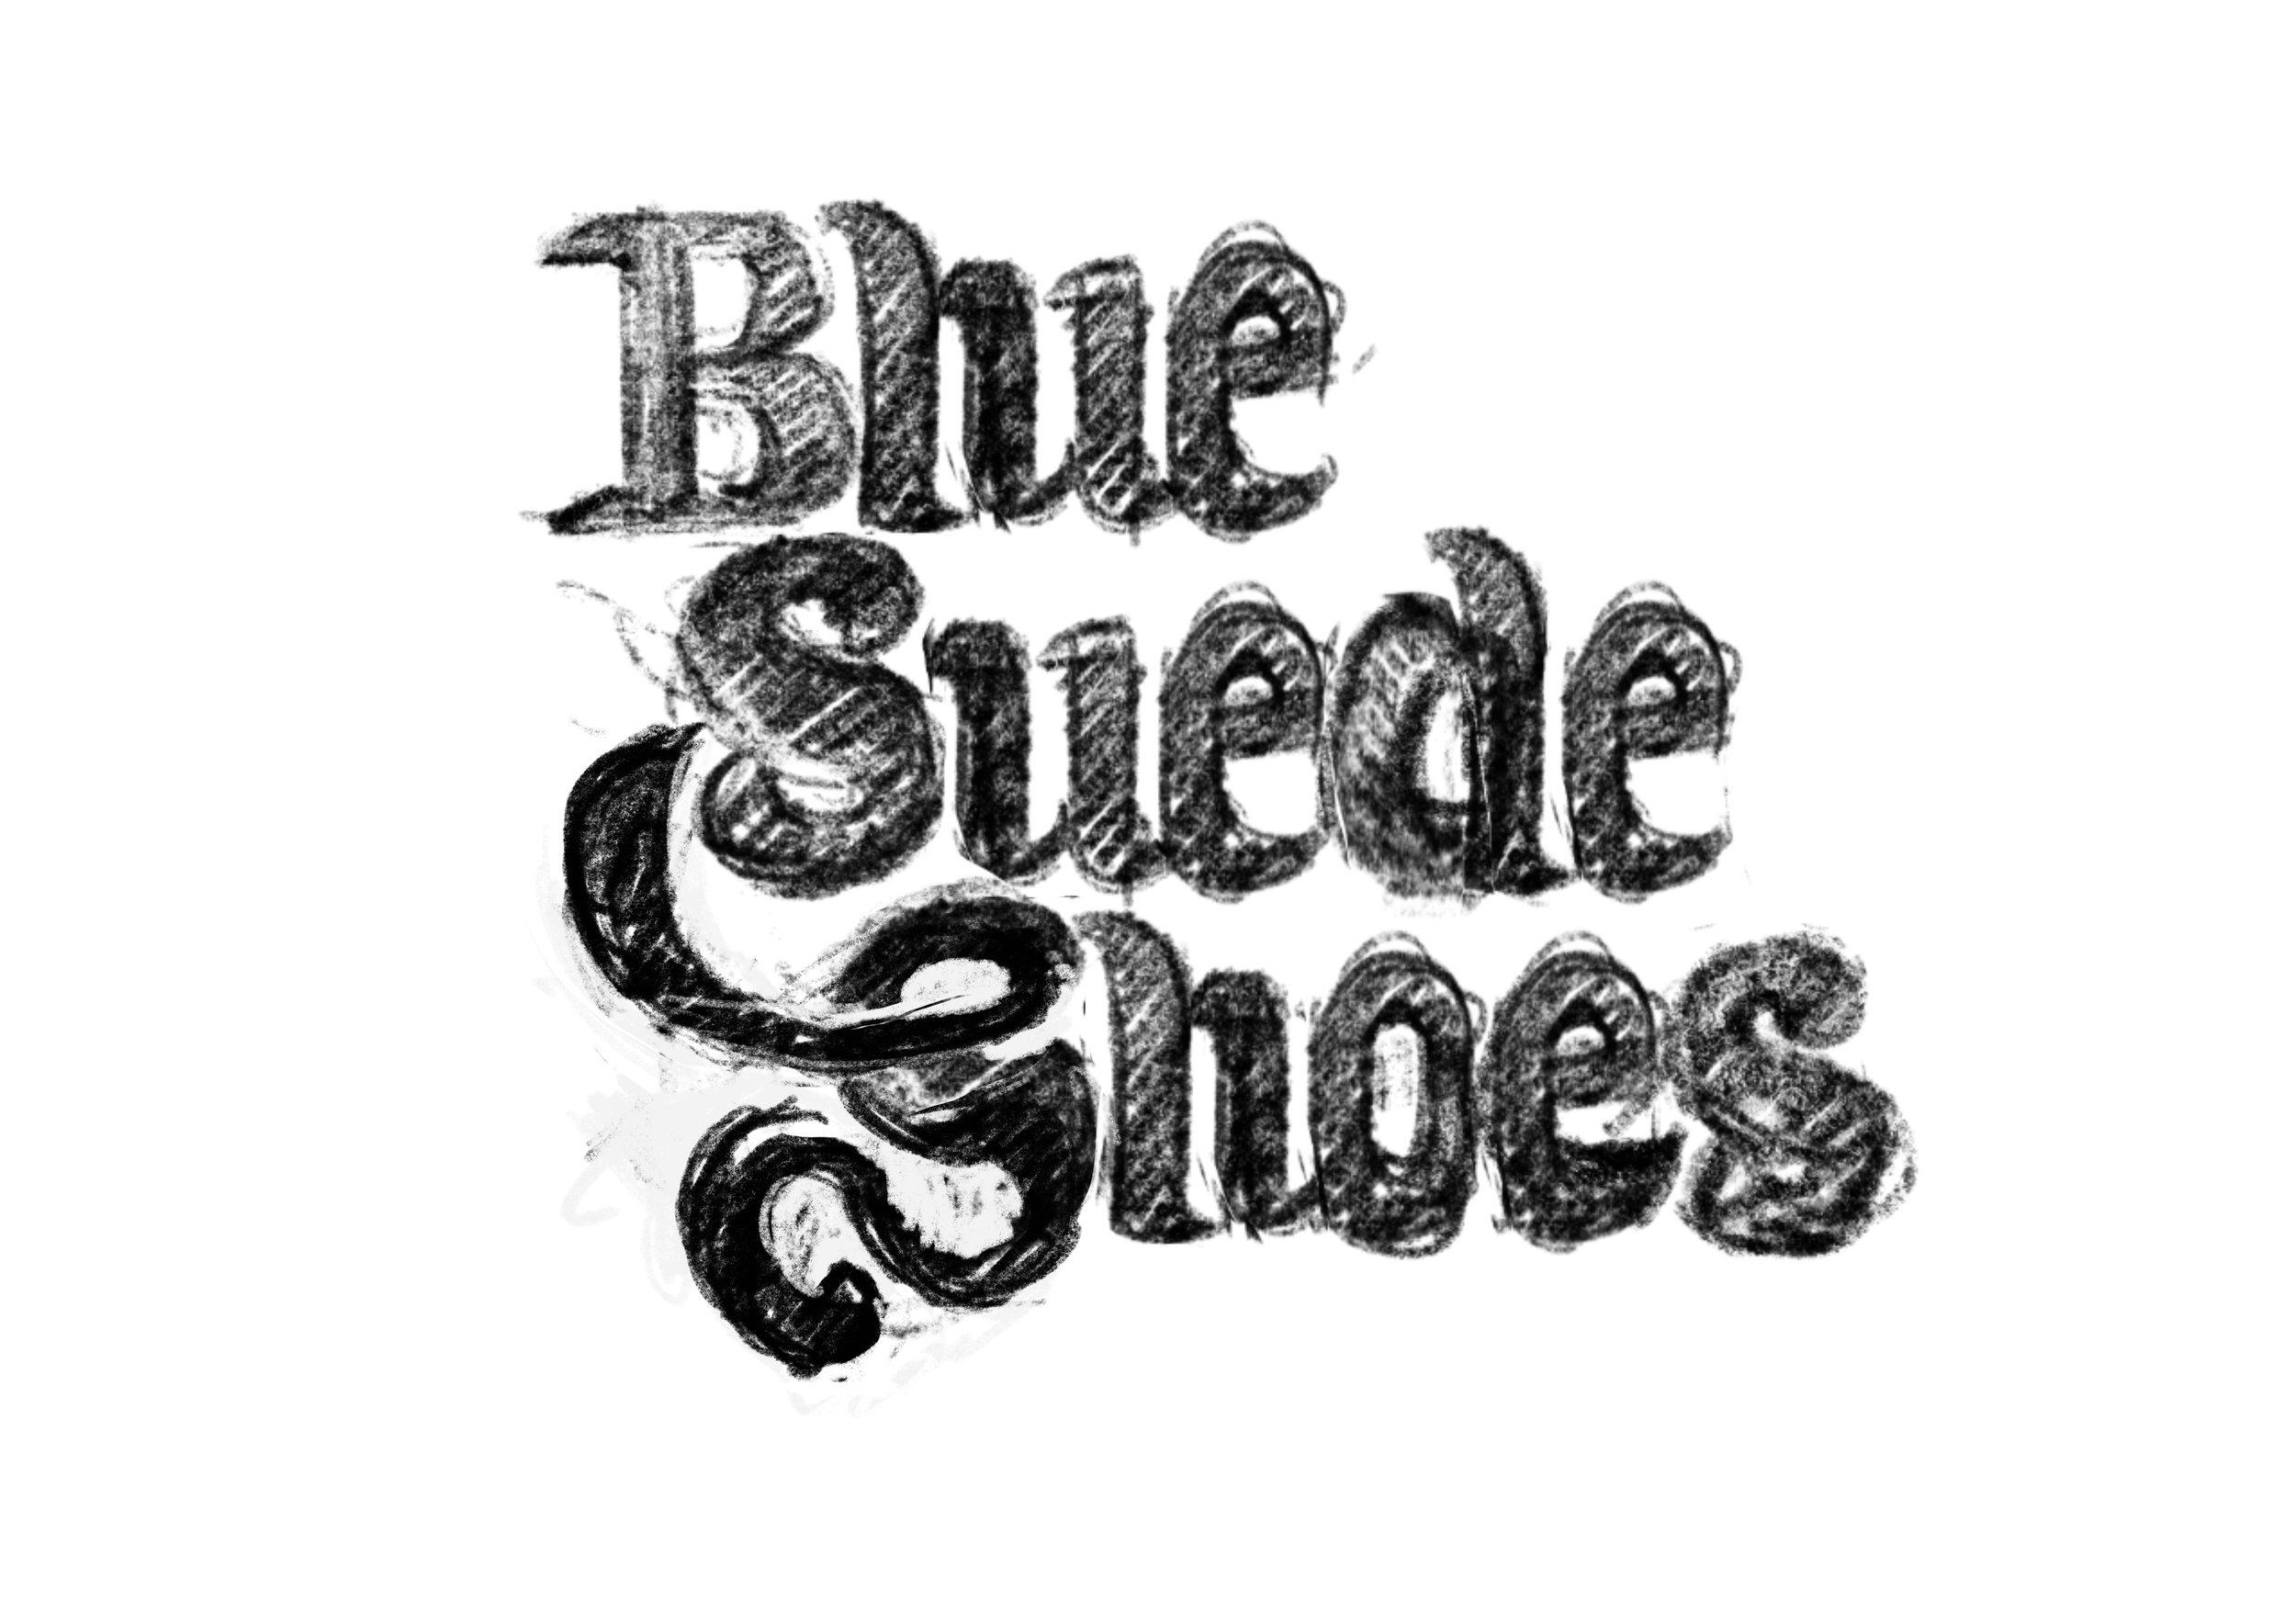 Blue_Suede_Shoes 4.jpg